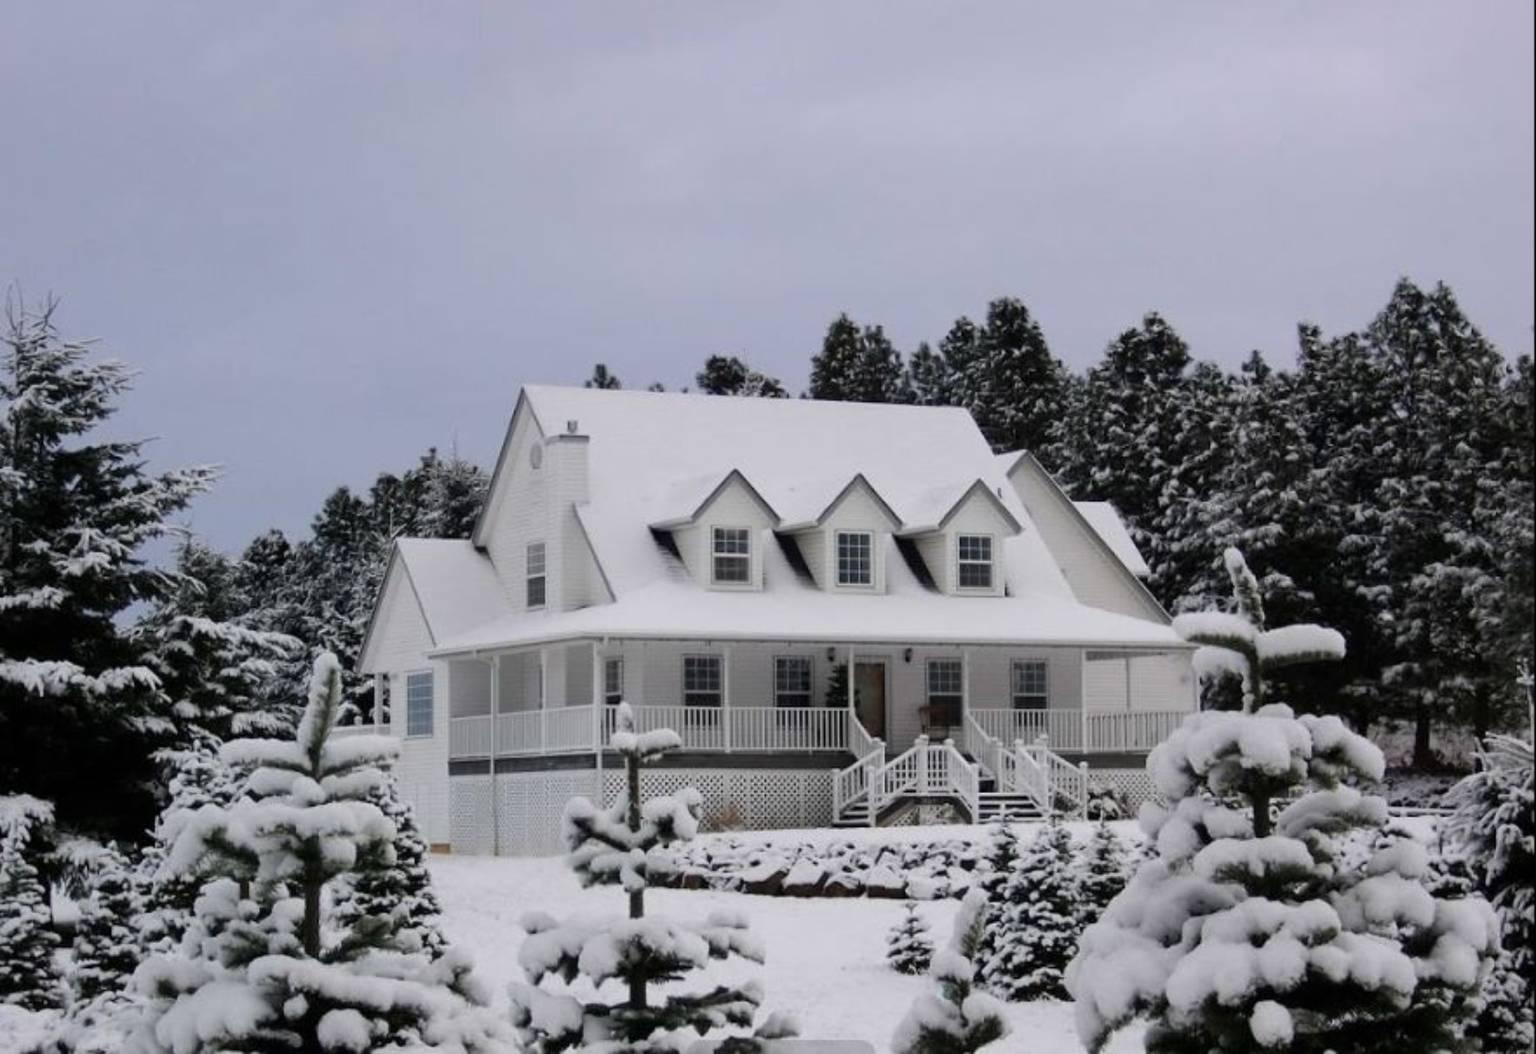 A house covered in snow at BlueBird Hill Farm B&B.